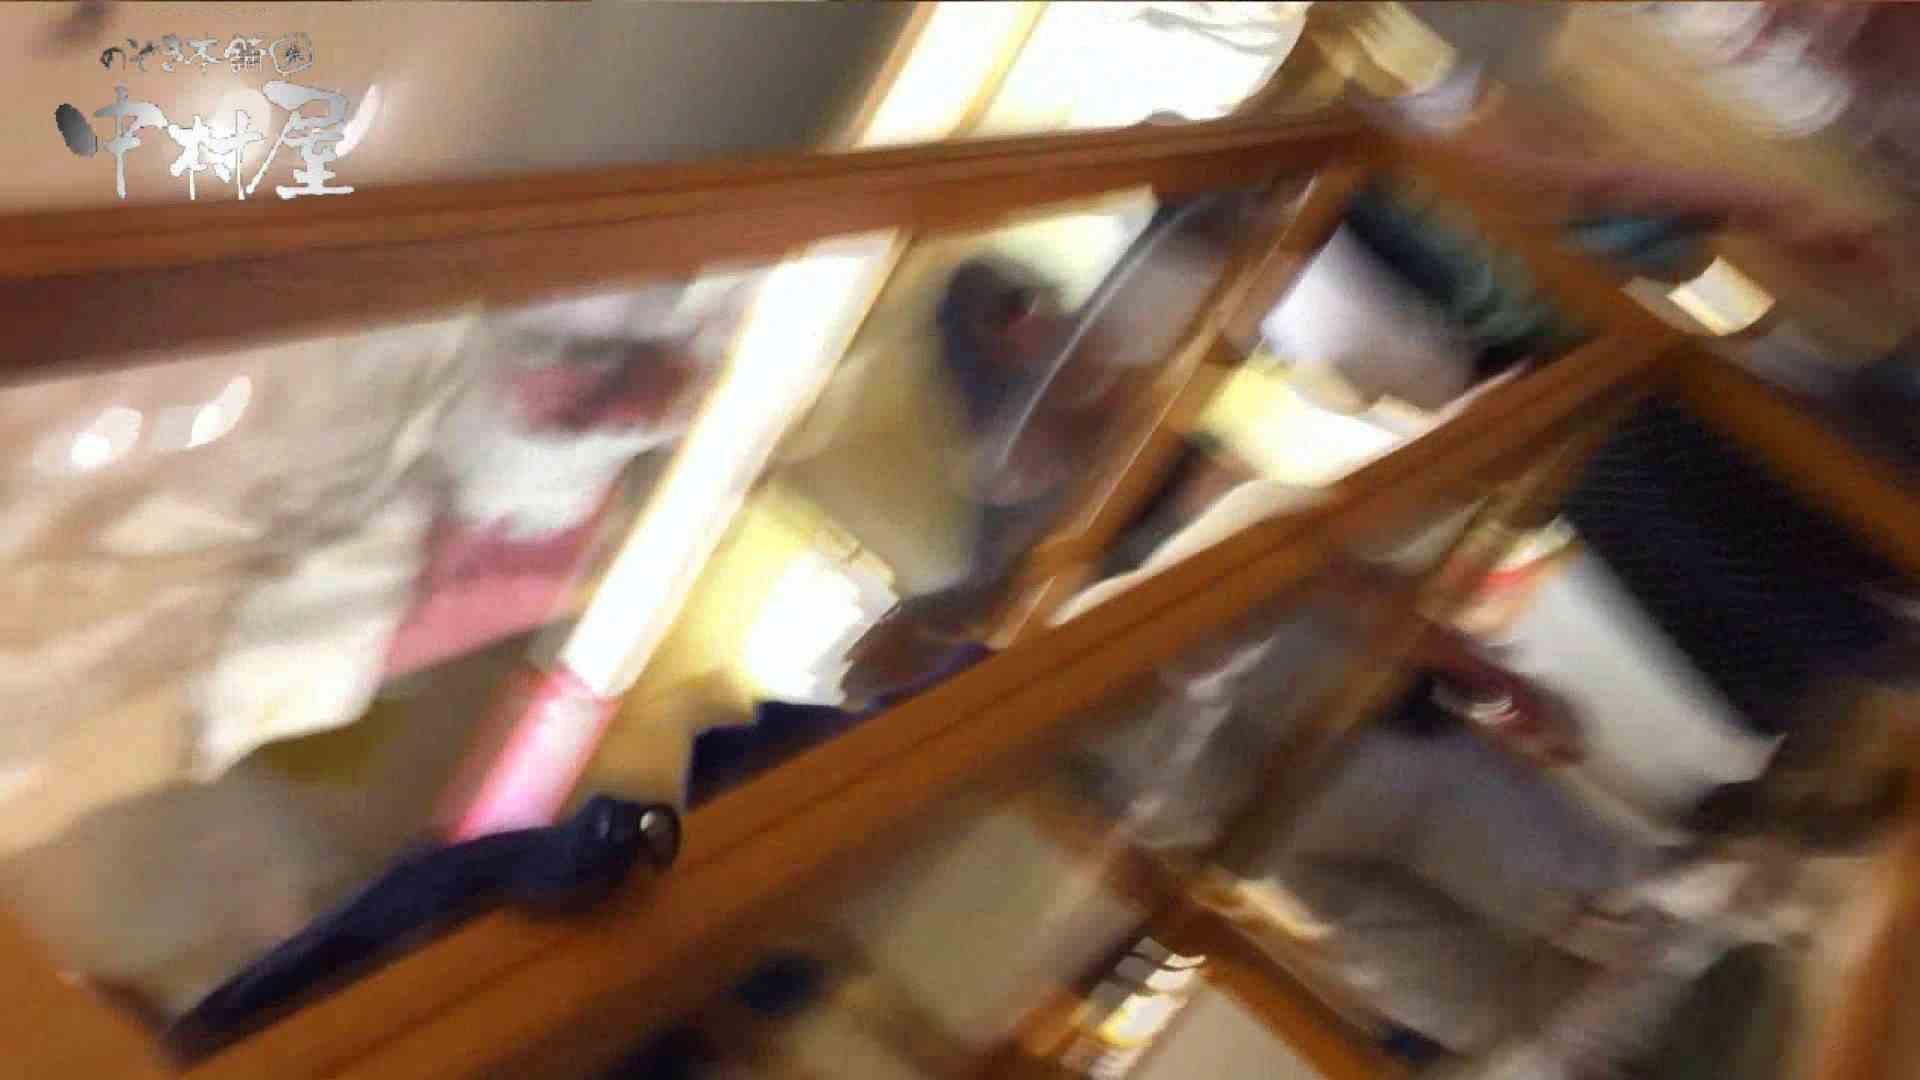 vol.65 美人アパレル胸チラ&パンチラ ムッチリ感がいい感じ花がらパンツさん パンチラ おめこ無修正画像 57連発 19